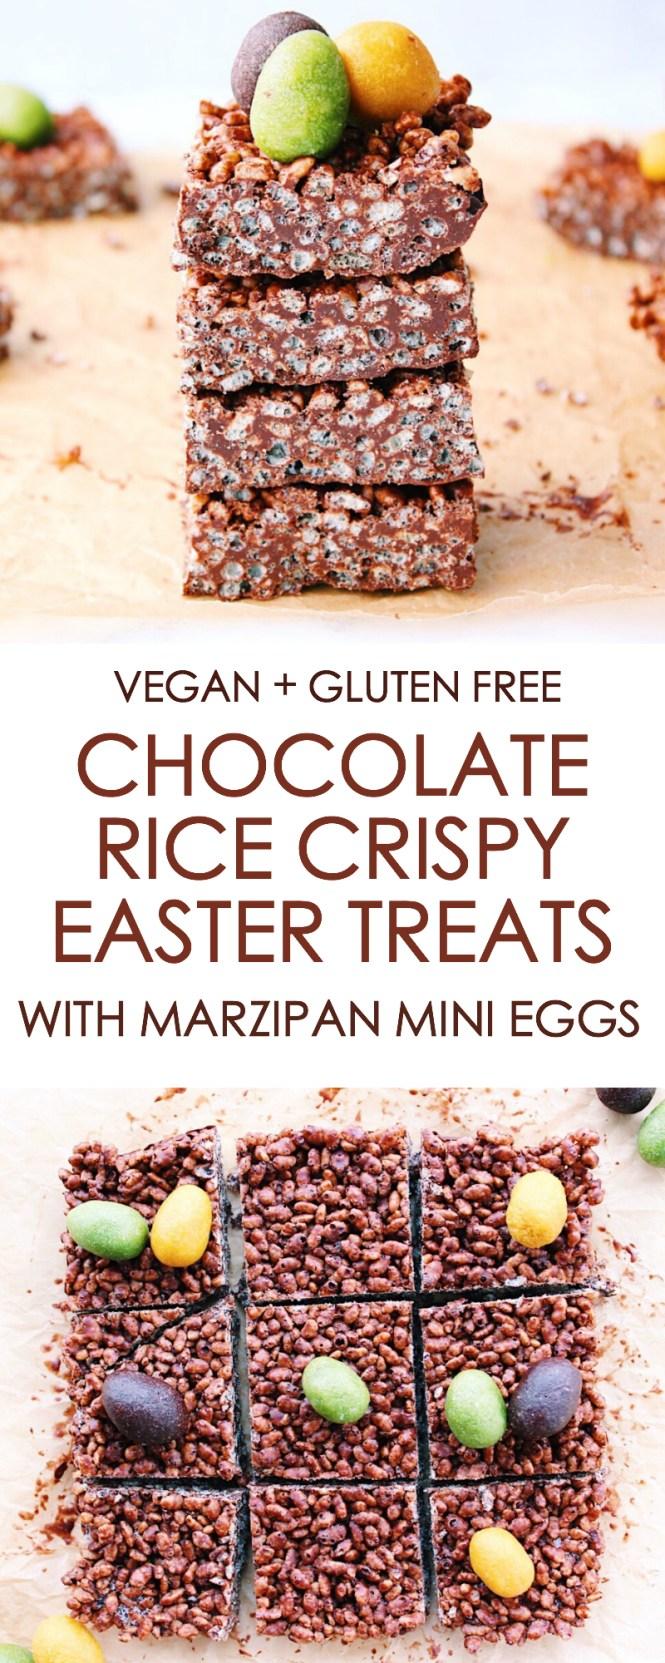 Chocolate Rice Crispy Treats with Marzipan Mini Eggs